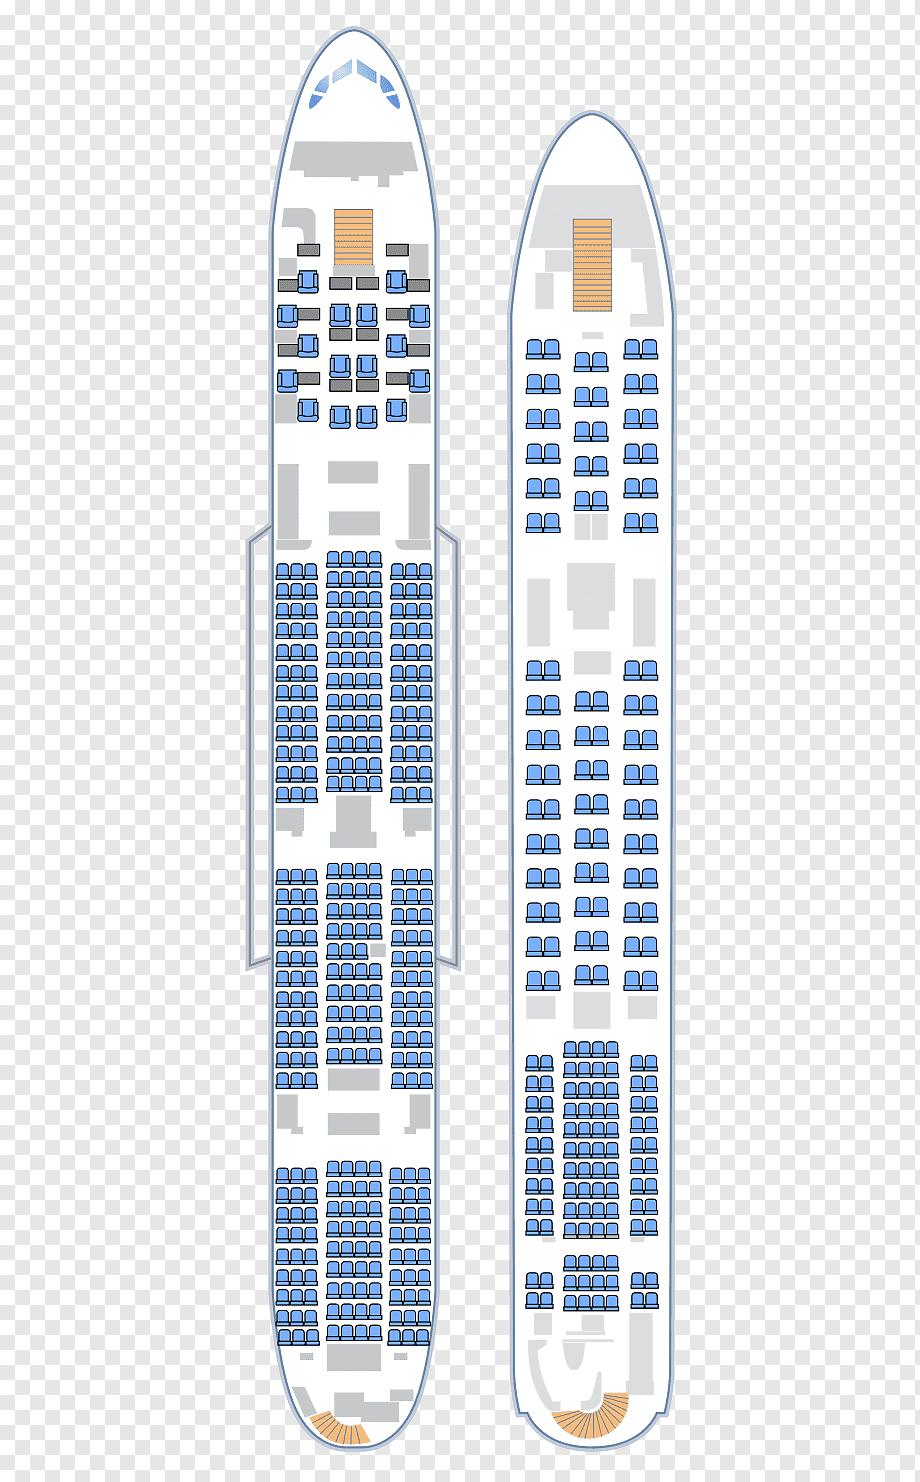 Lufthansa A380 Seat Map : lufthansa, Airbus, A380-800, Lufthansa,, Seat,, A380,, Seating, PNGWing